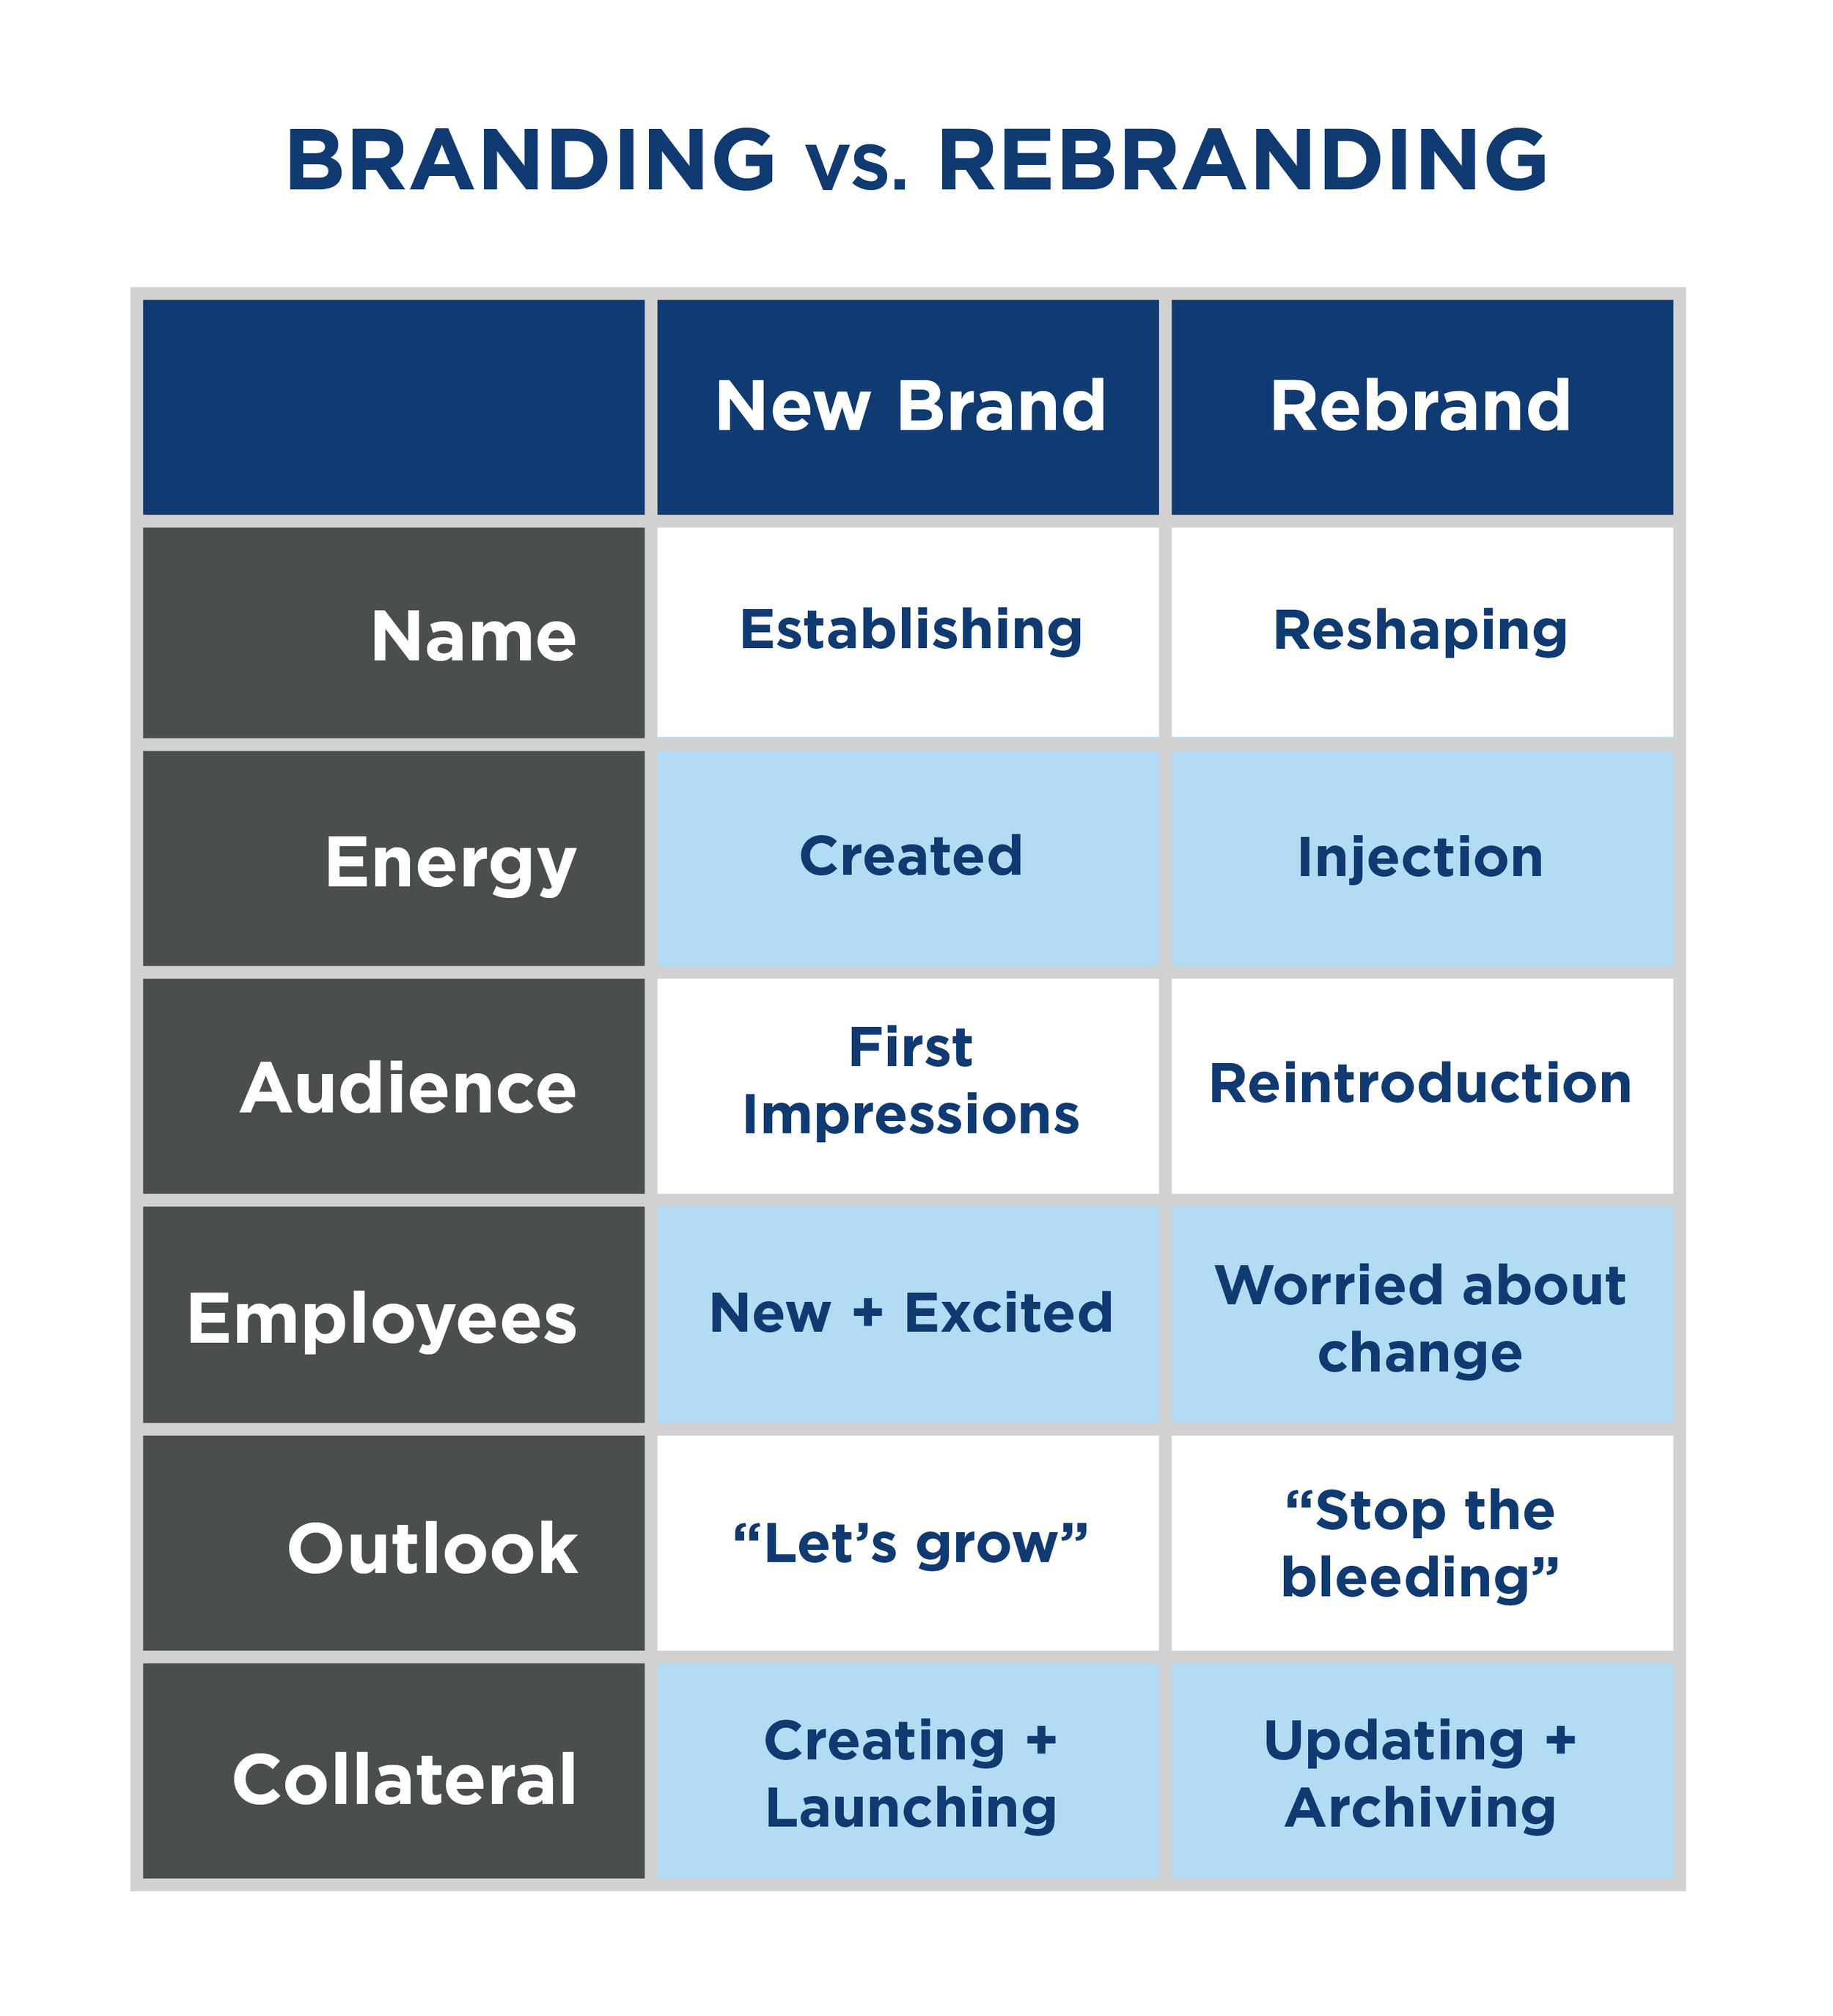 Brand Strategy: Branding vs. Rebranding